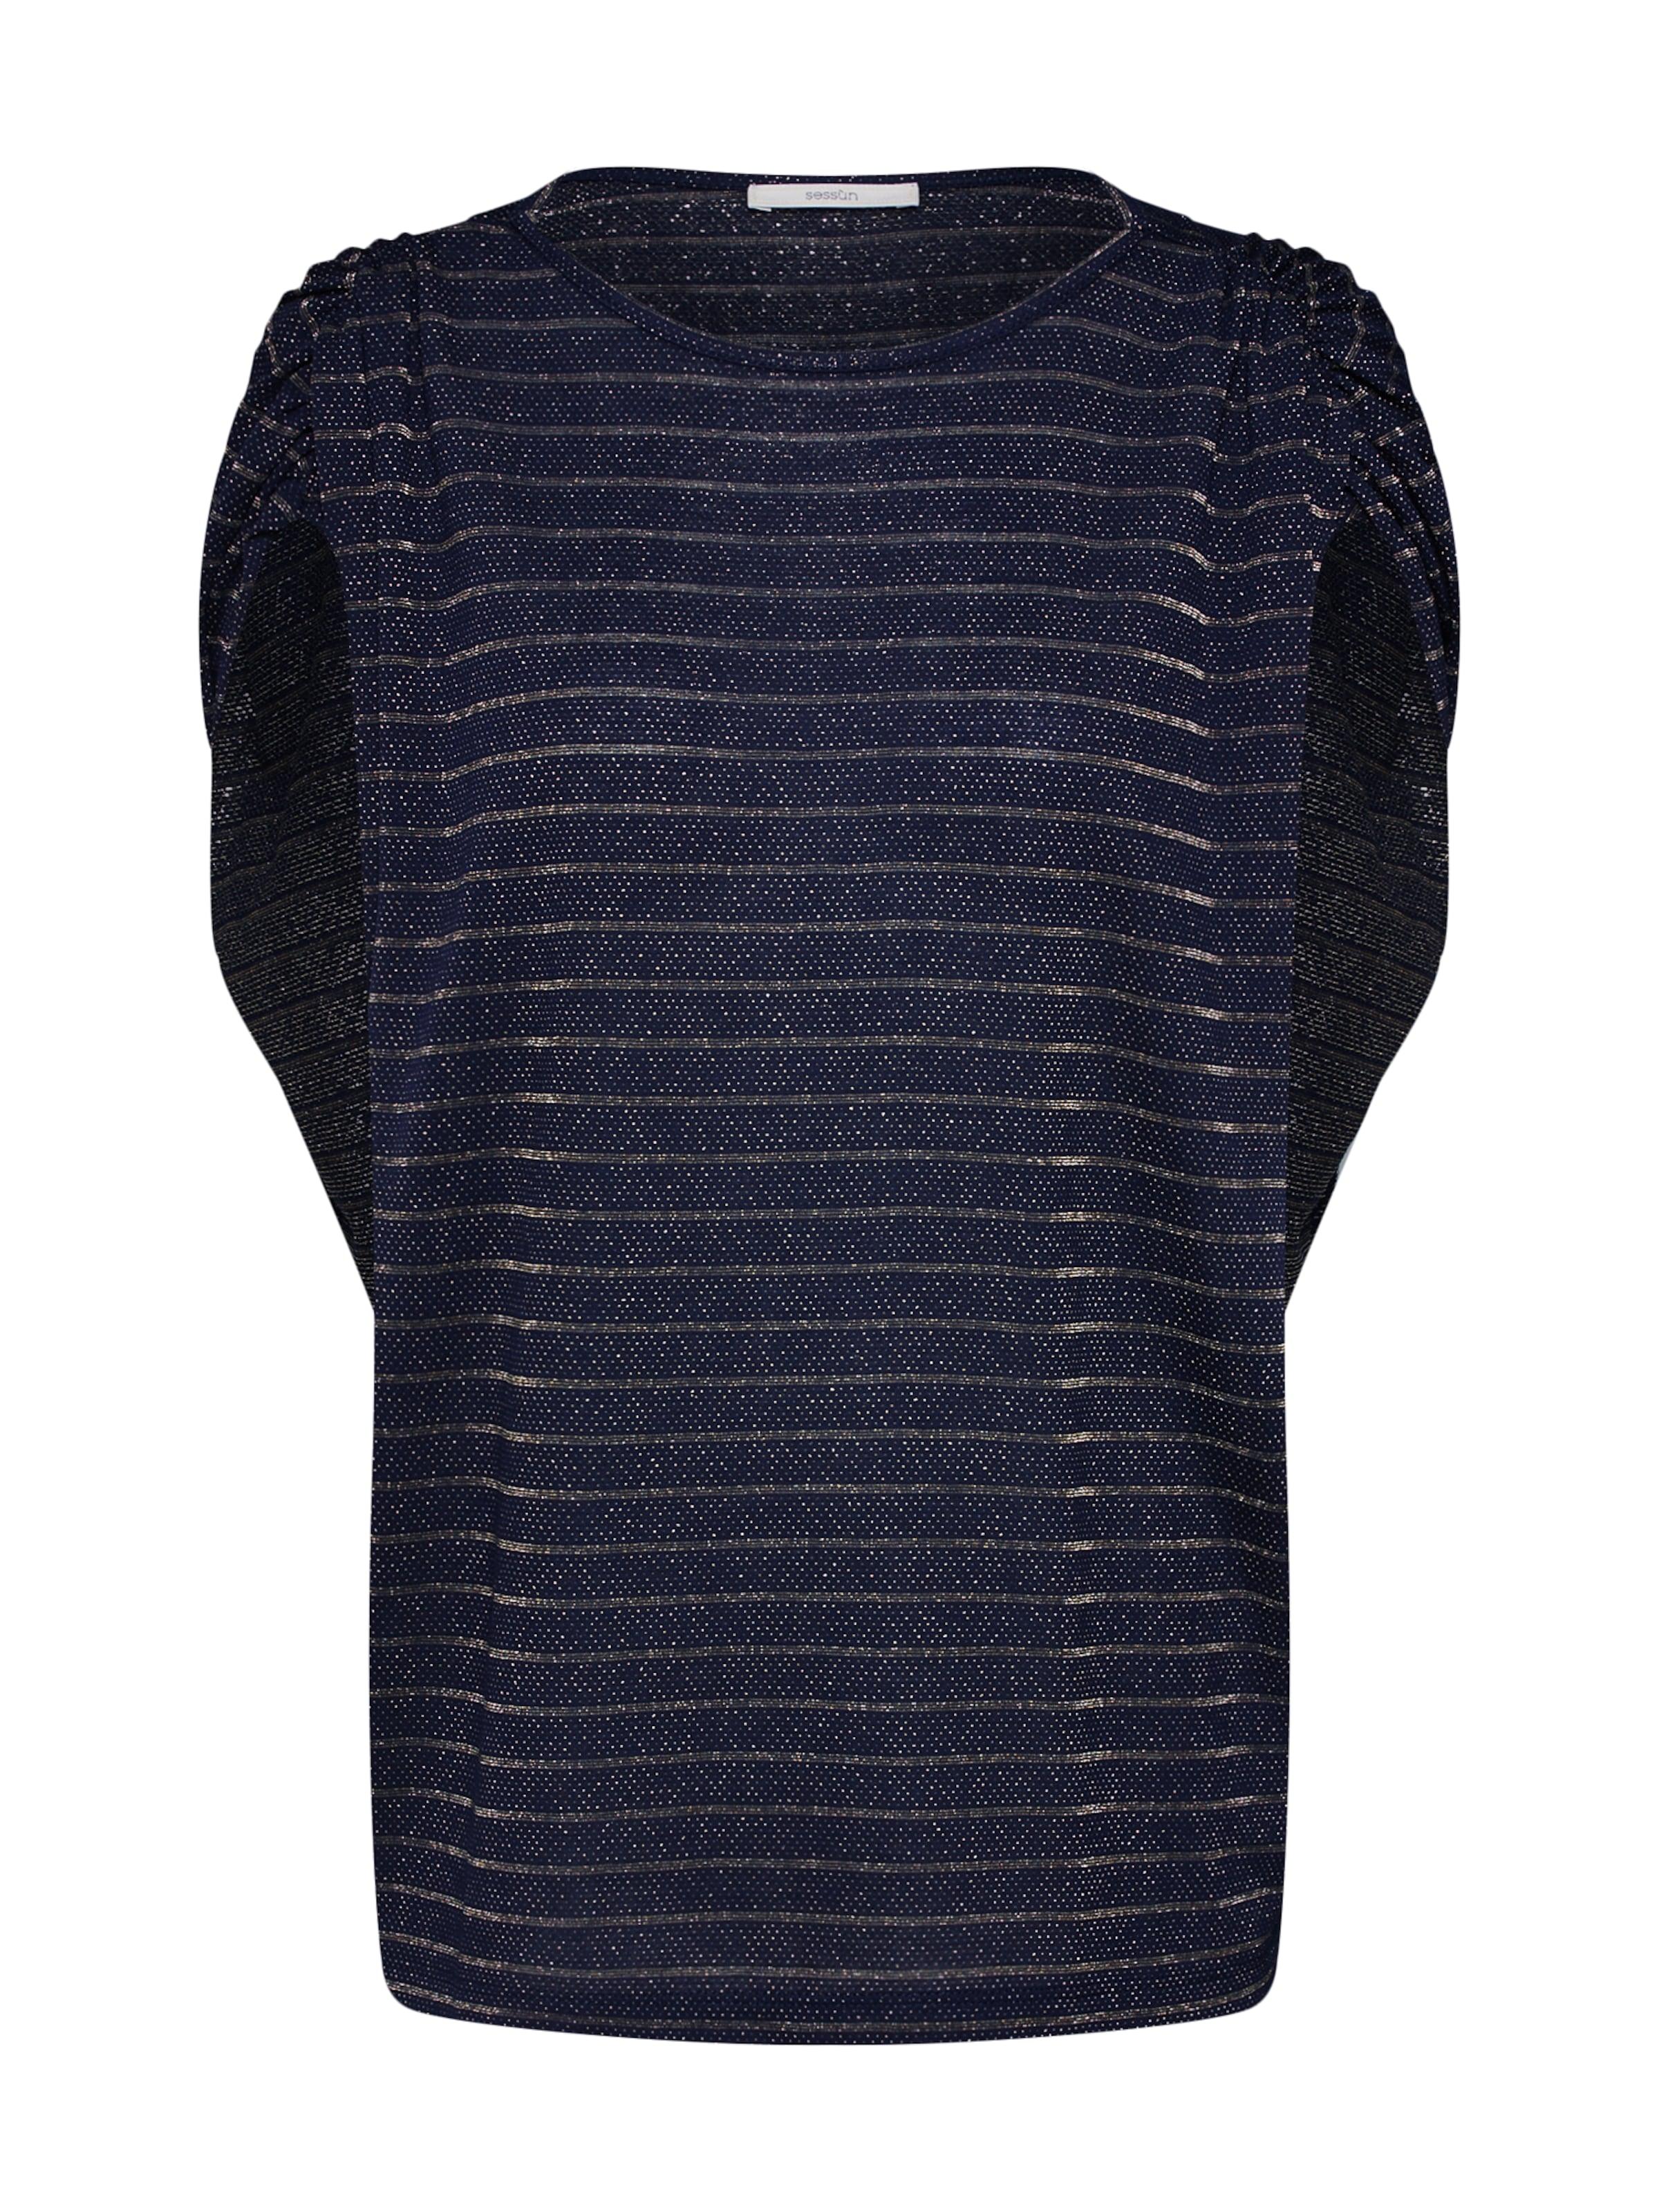 shirt En Bleu MarineOr T Sessun nPkZNO0X8w